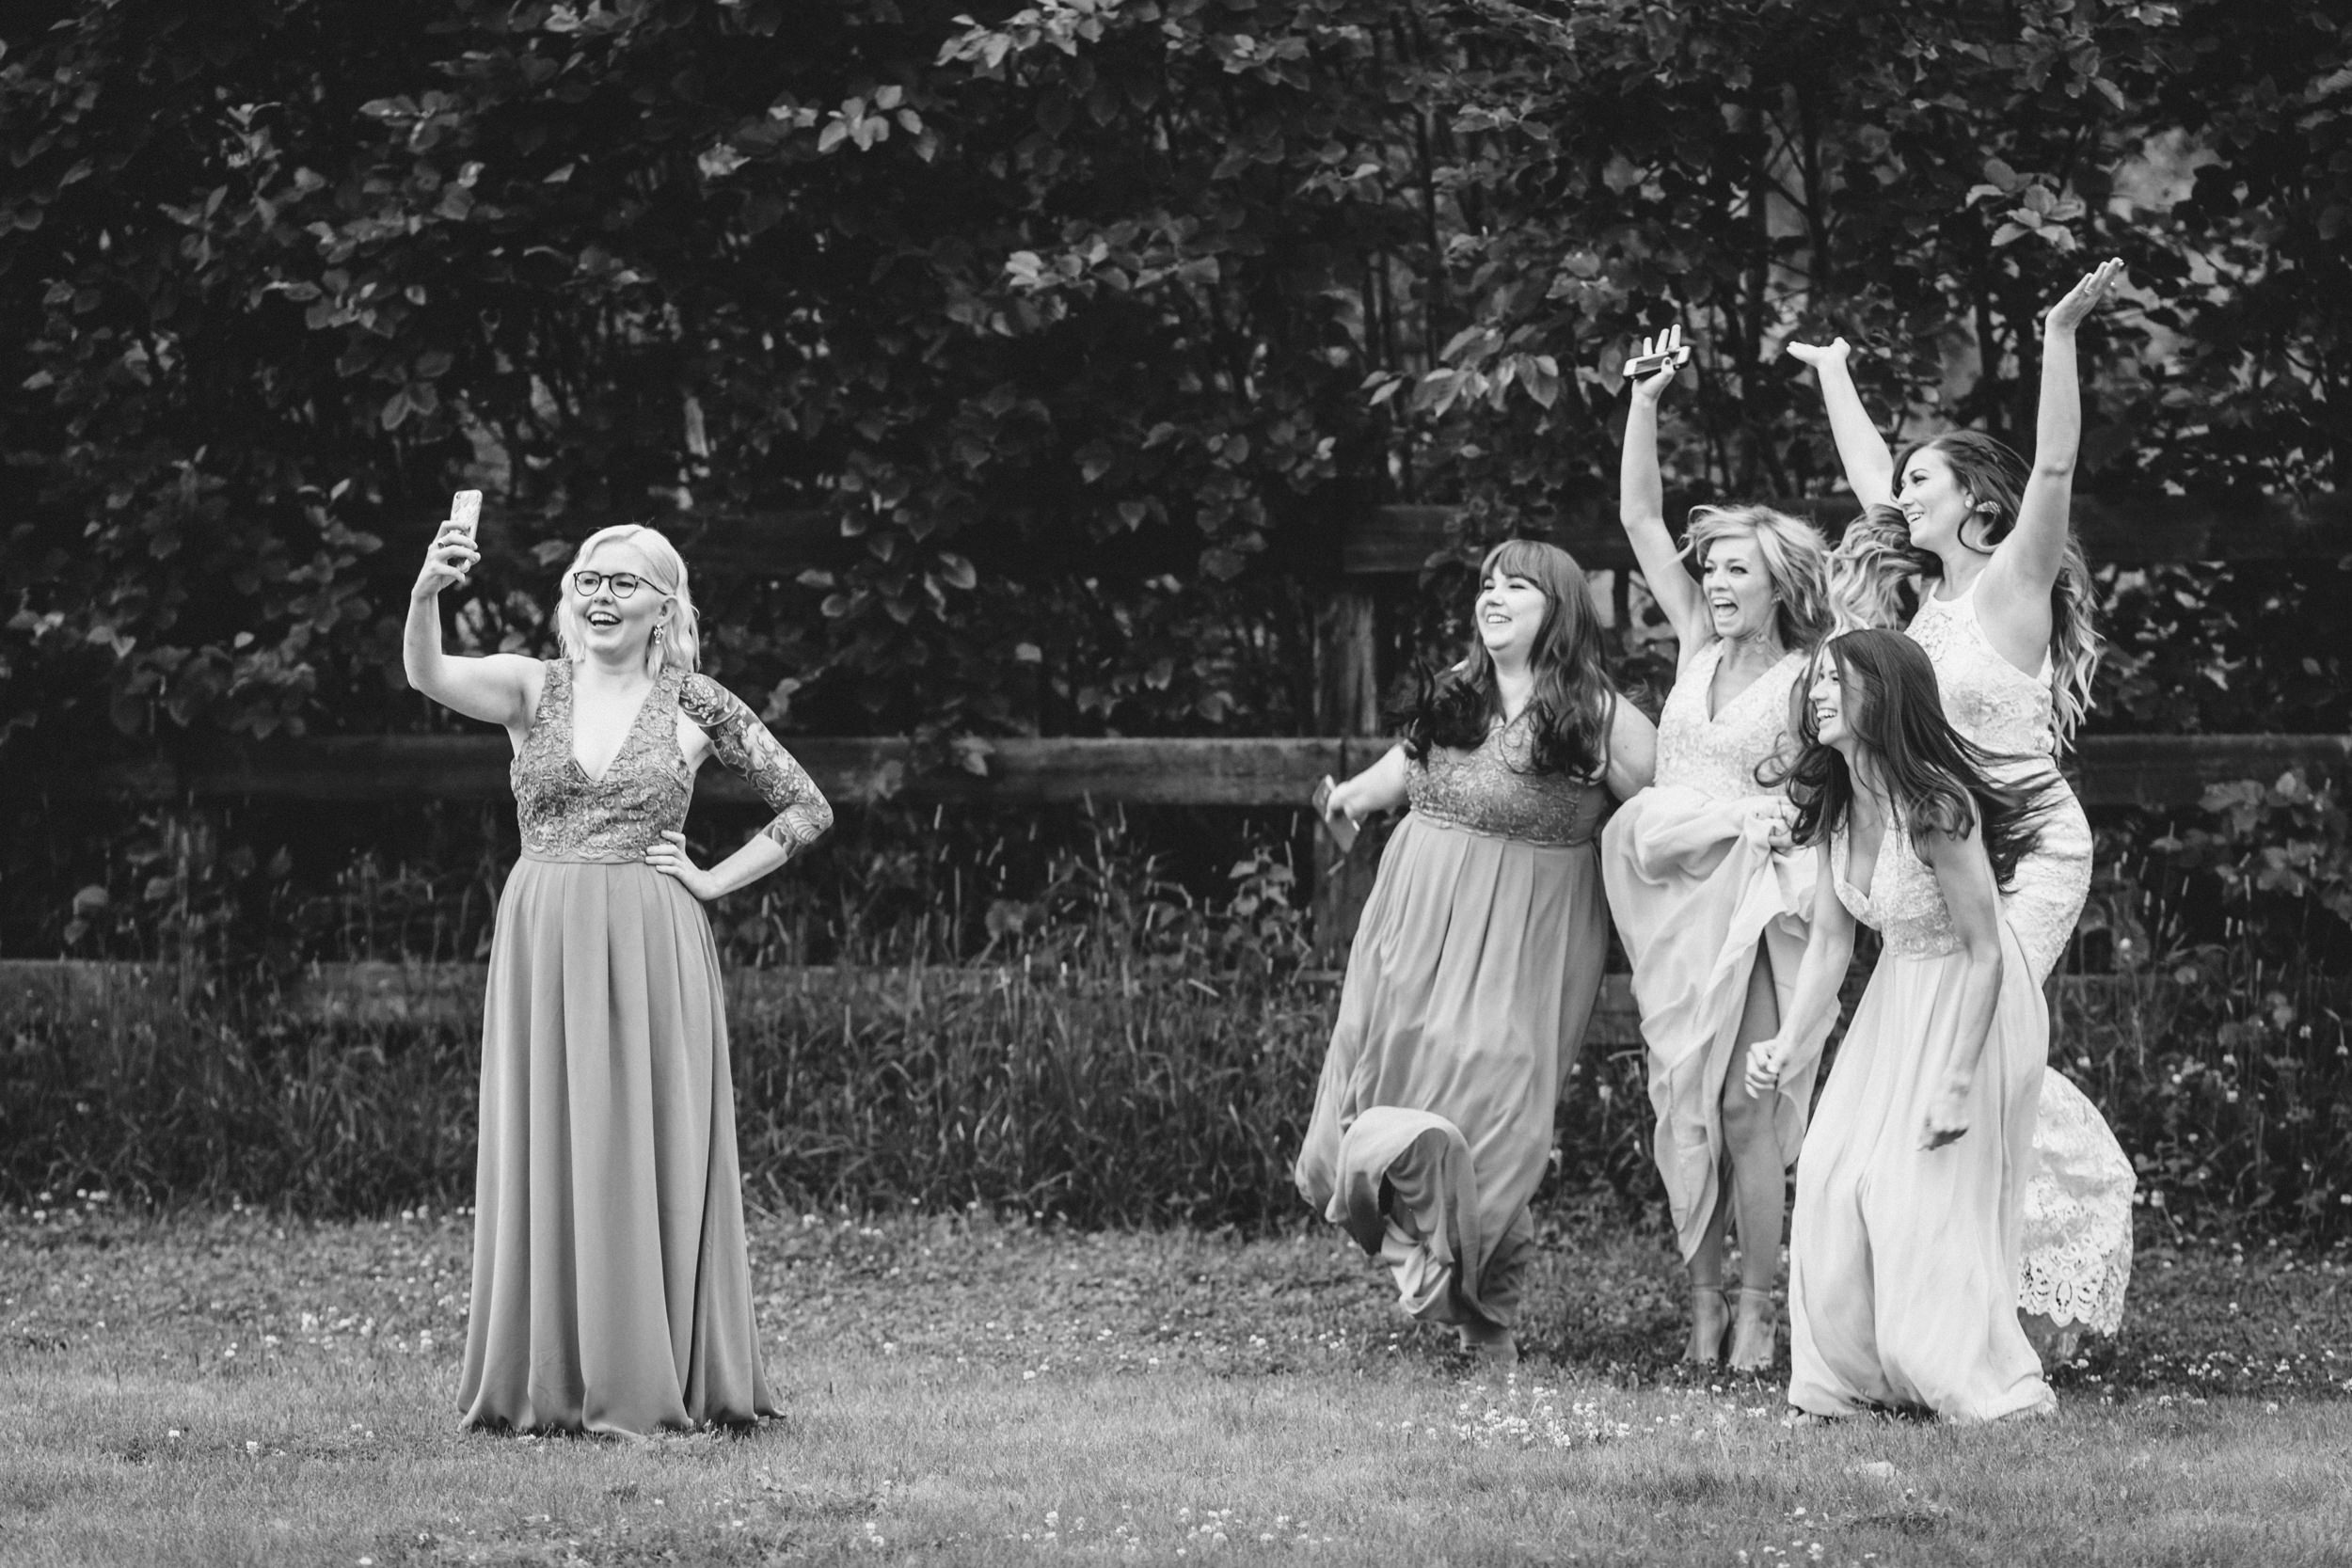 Alaskan bridesmaids posing for a jump photo